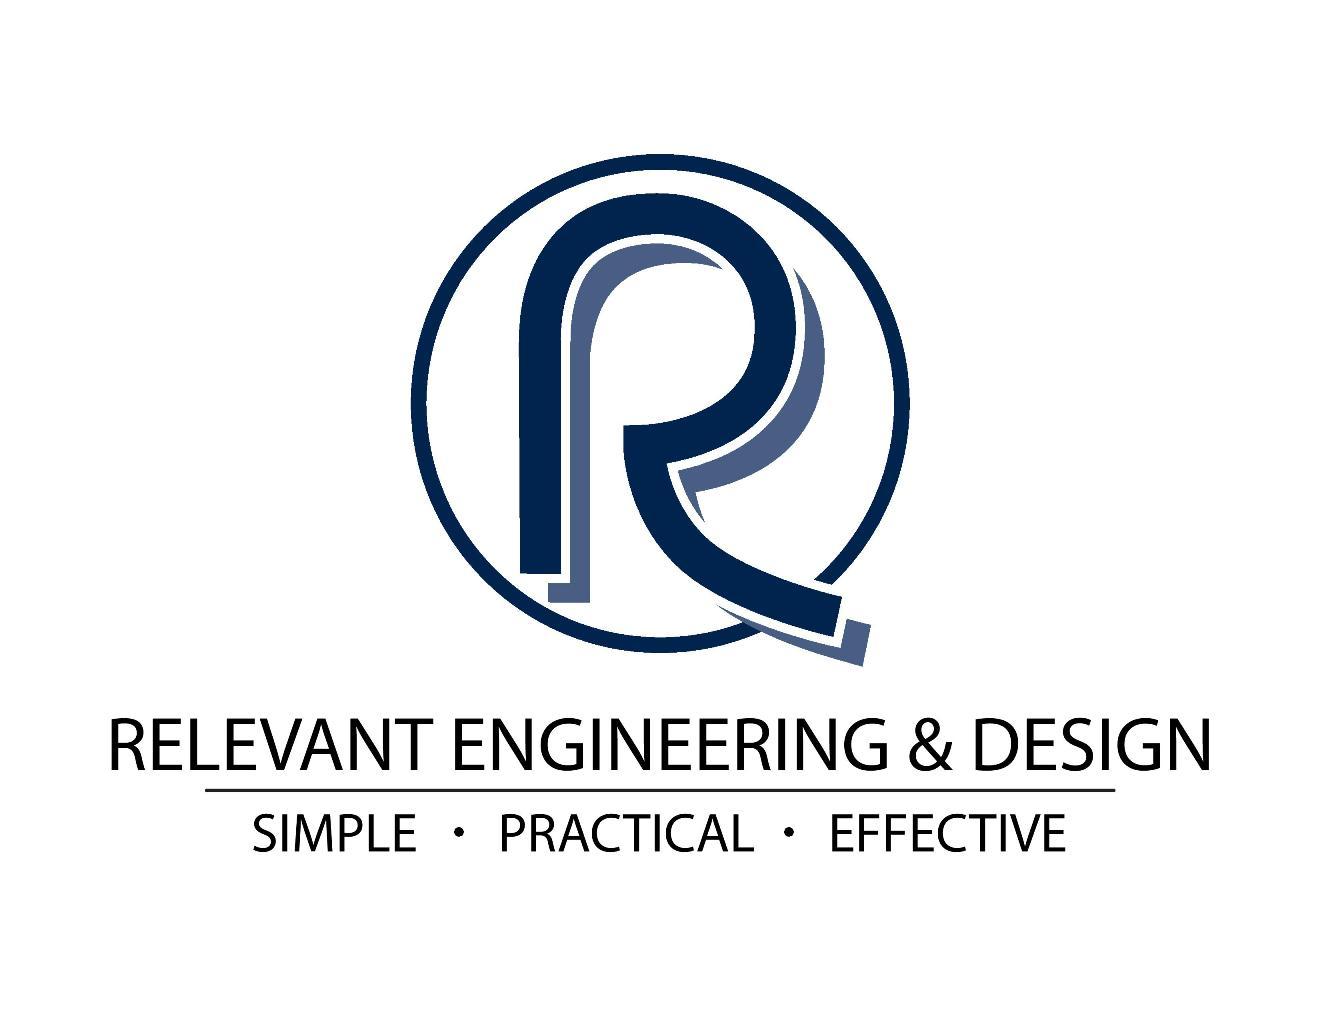 Relevant Engineering & Design image